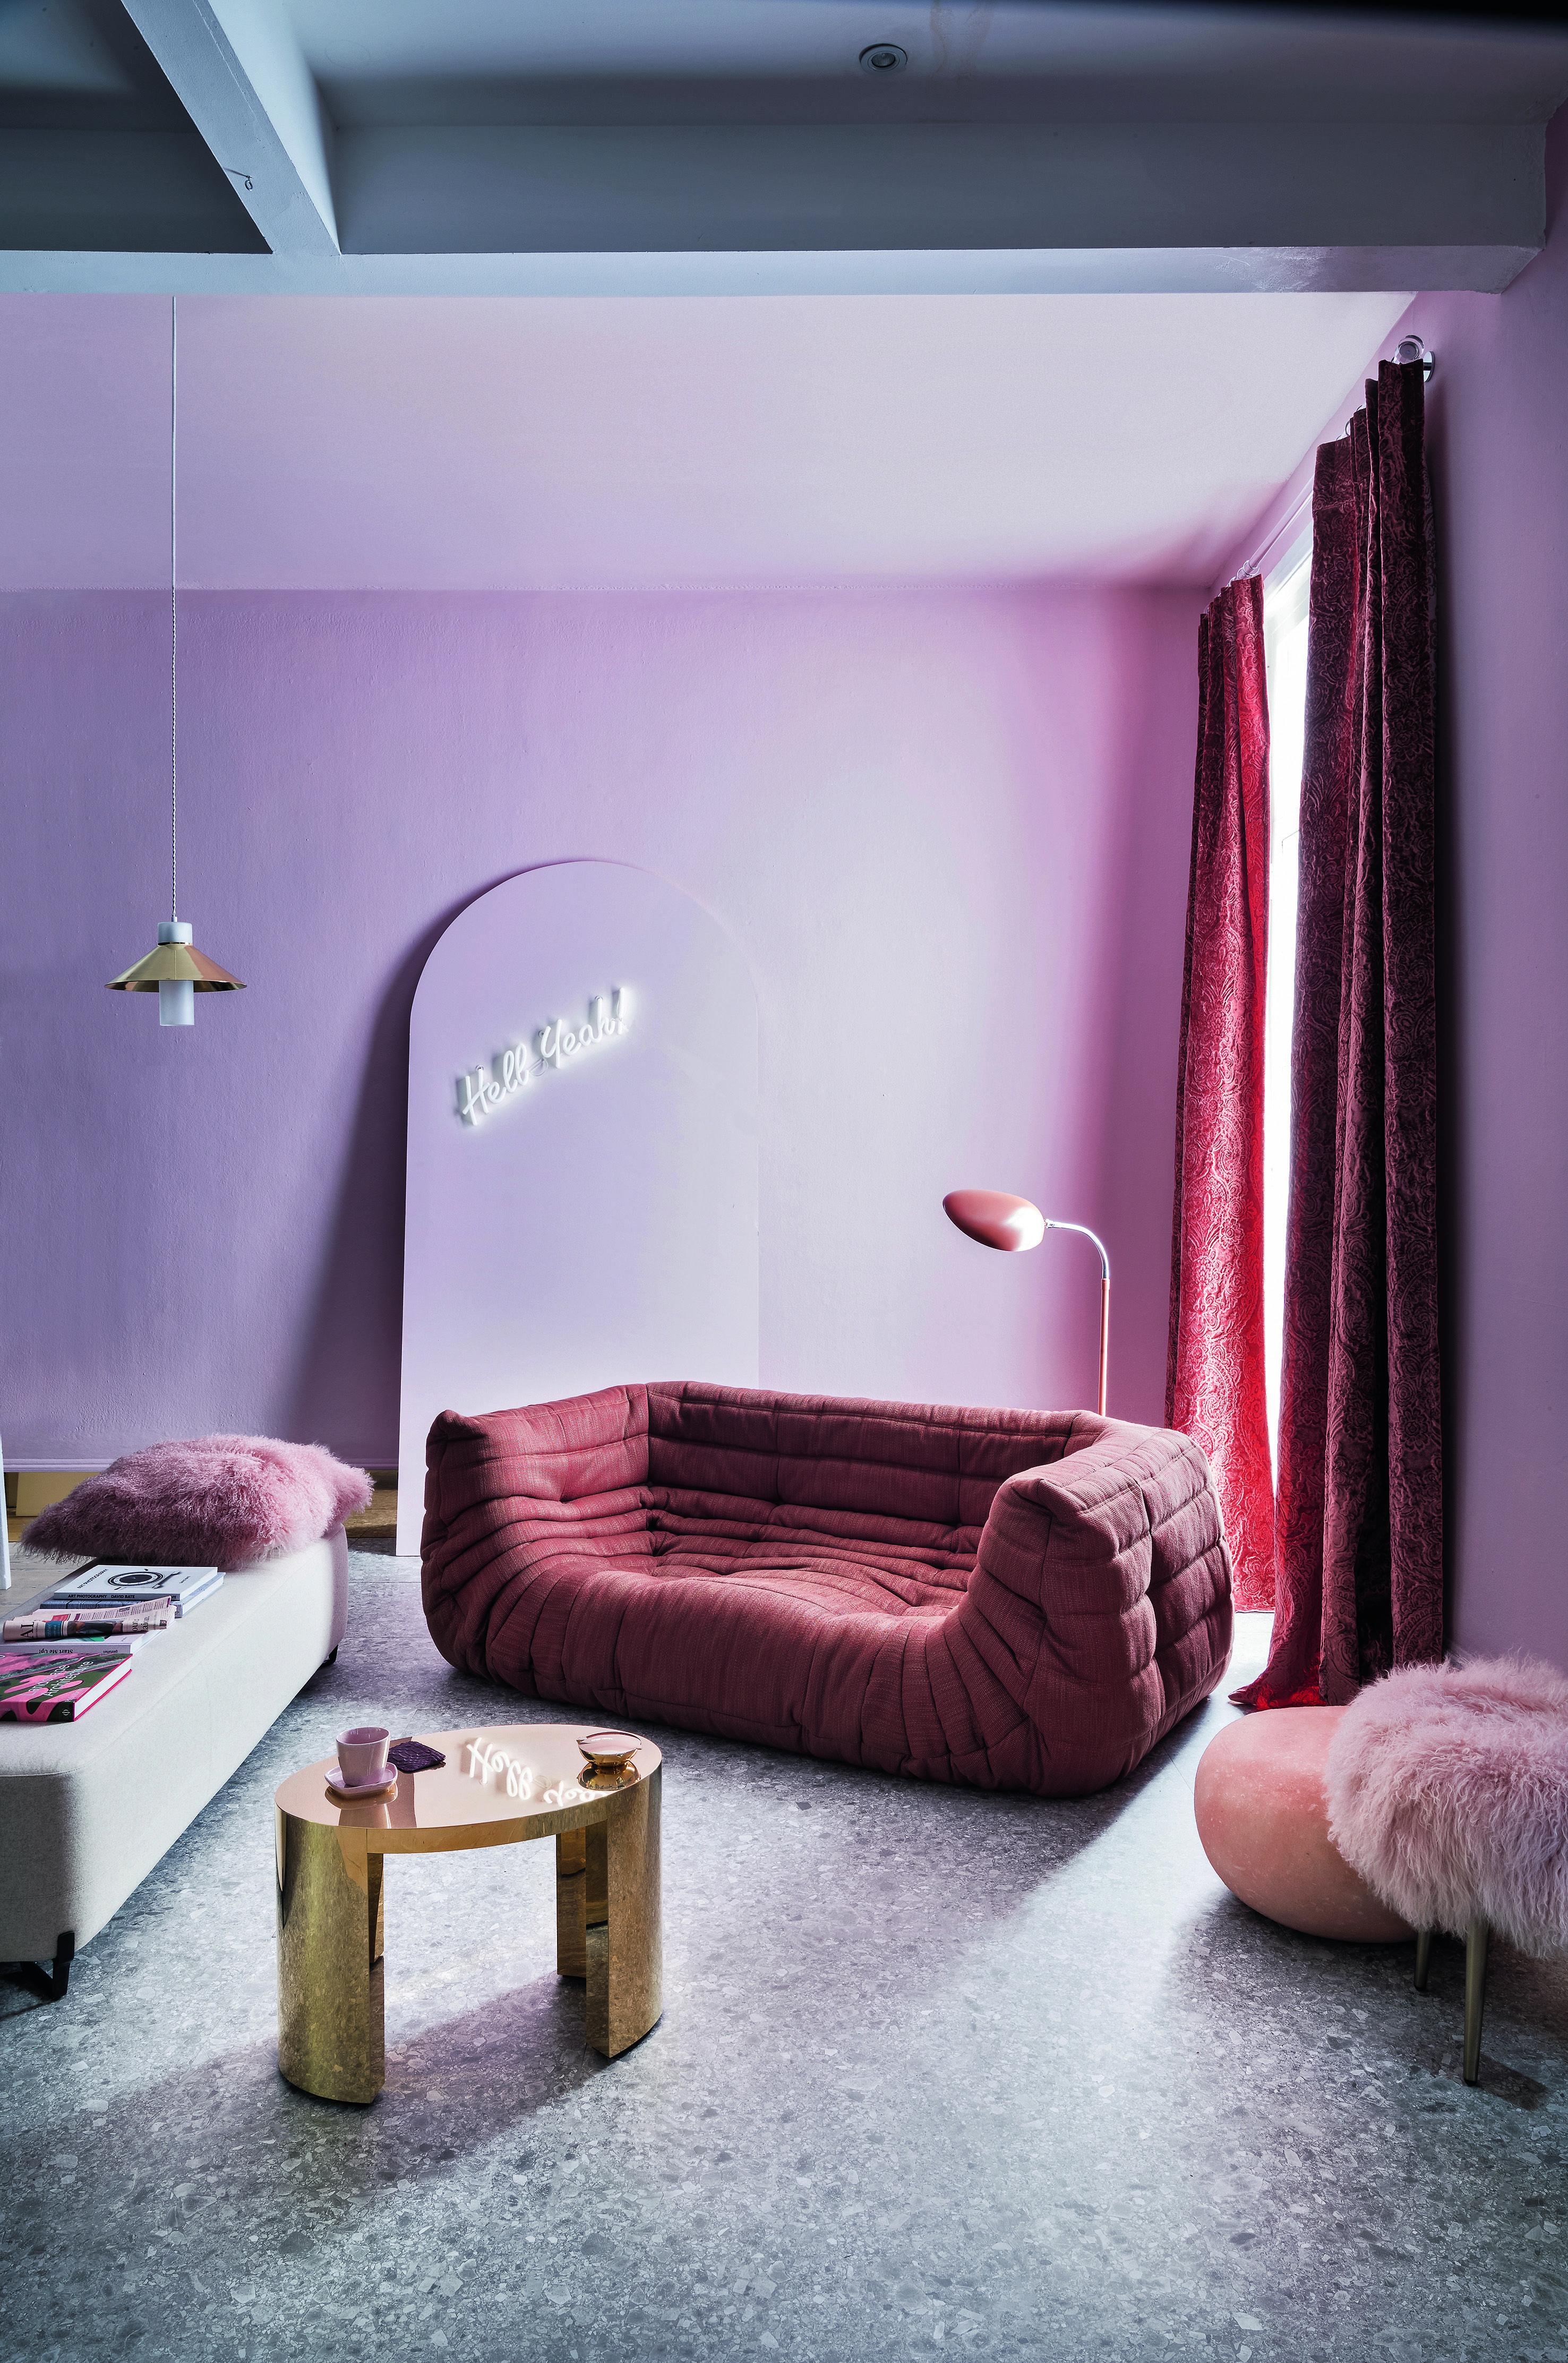 blush home decor ideas eclectic interiors home decor. Black Bedroom Furniture Sets. Home Design Ideas